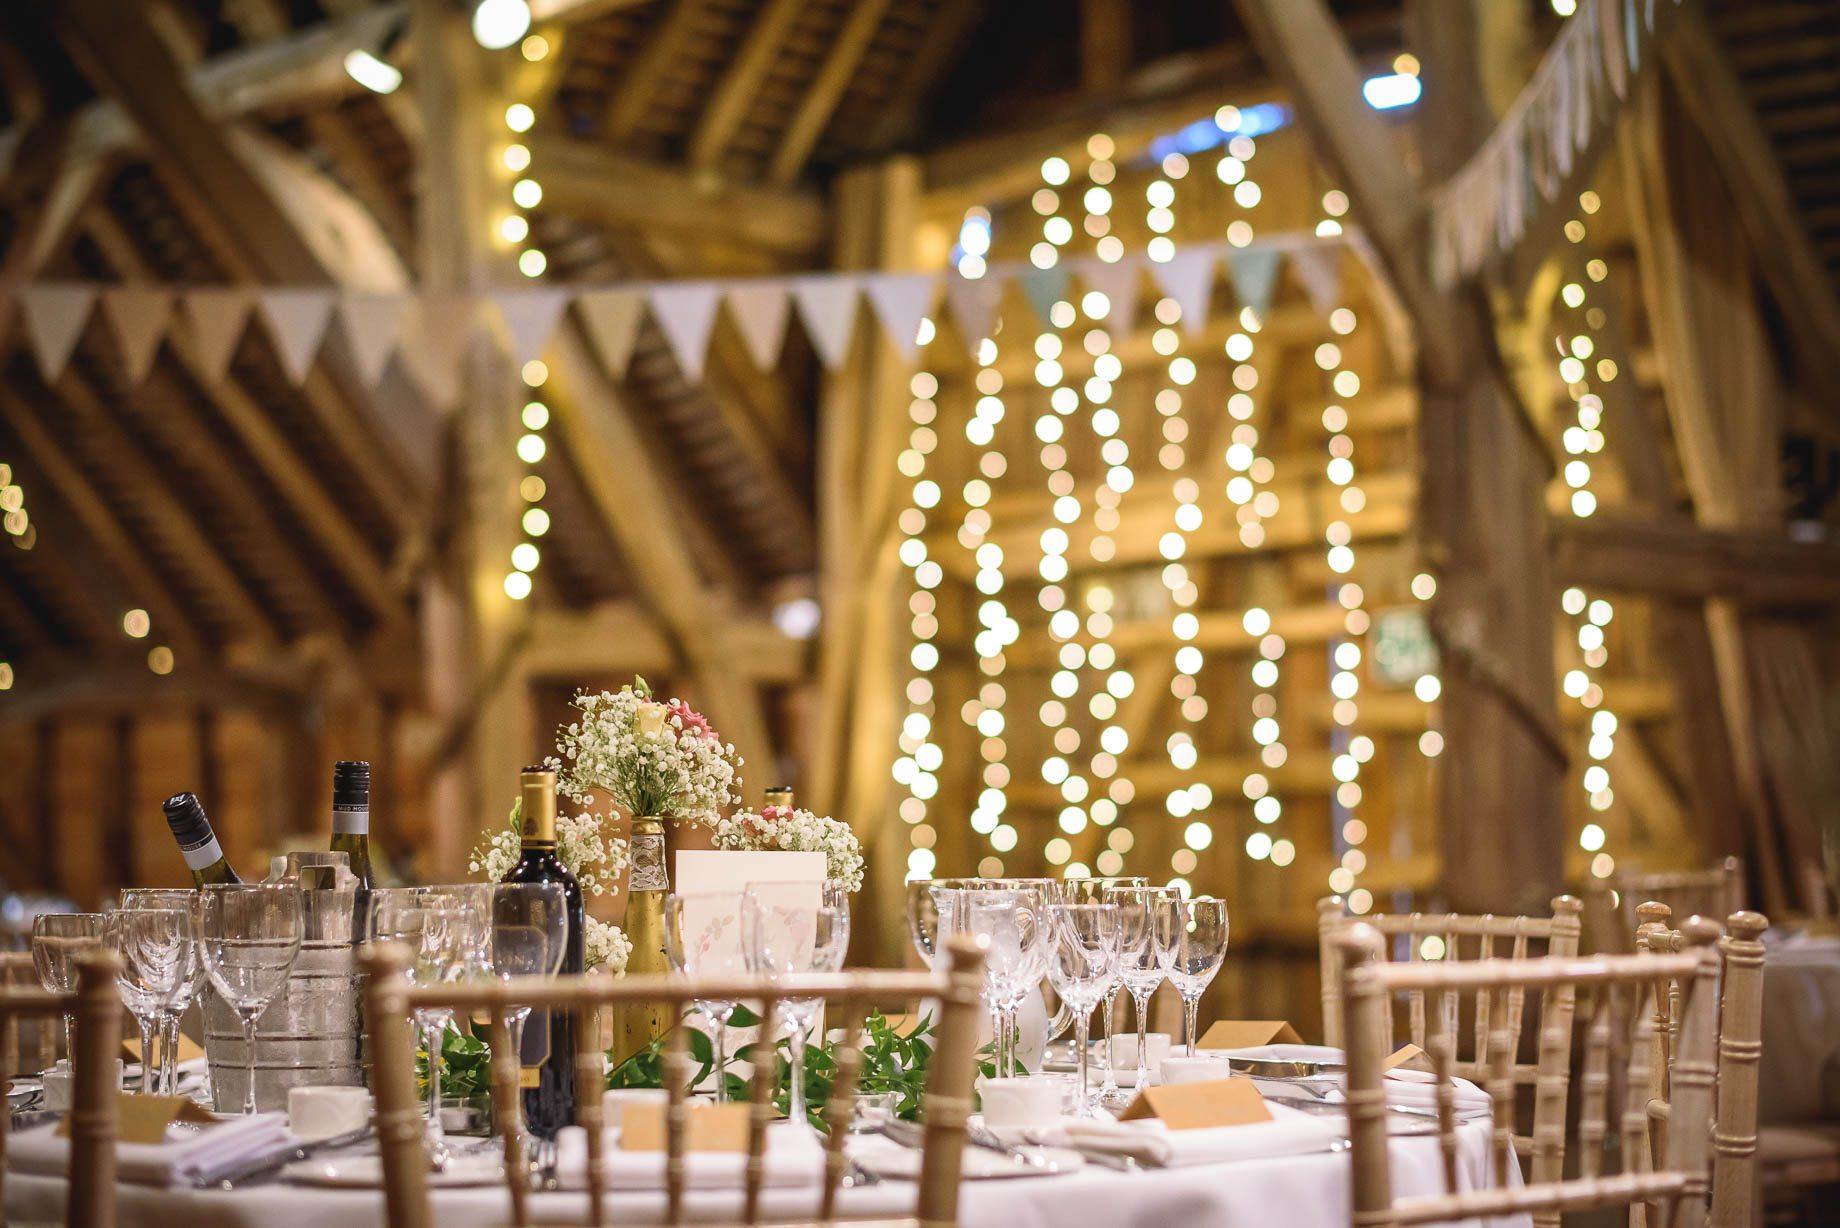 Gildings Barn wedding photography - Sarah and Steve (116 of 190)